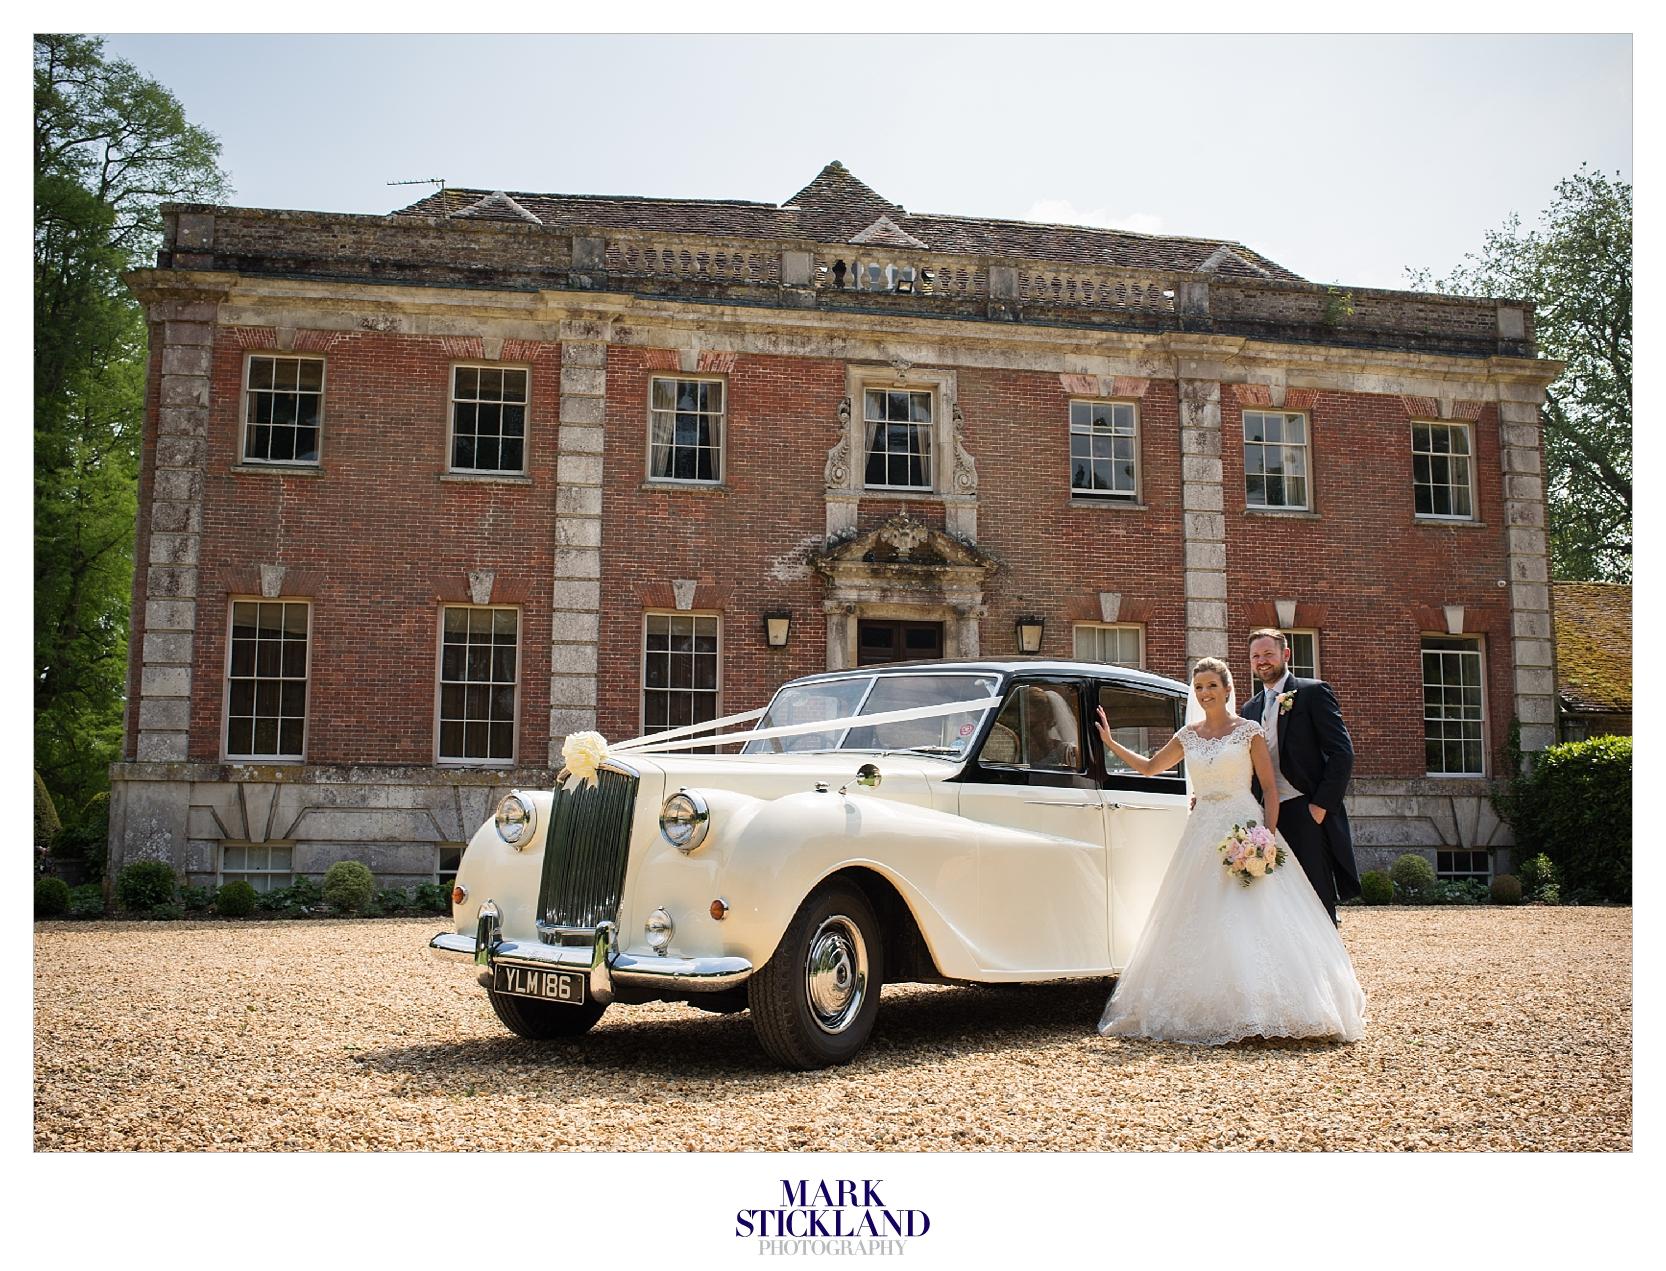 021.deans_court_wedding_wimborne_dorset